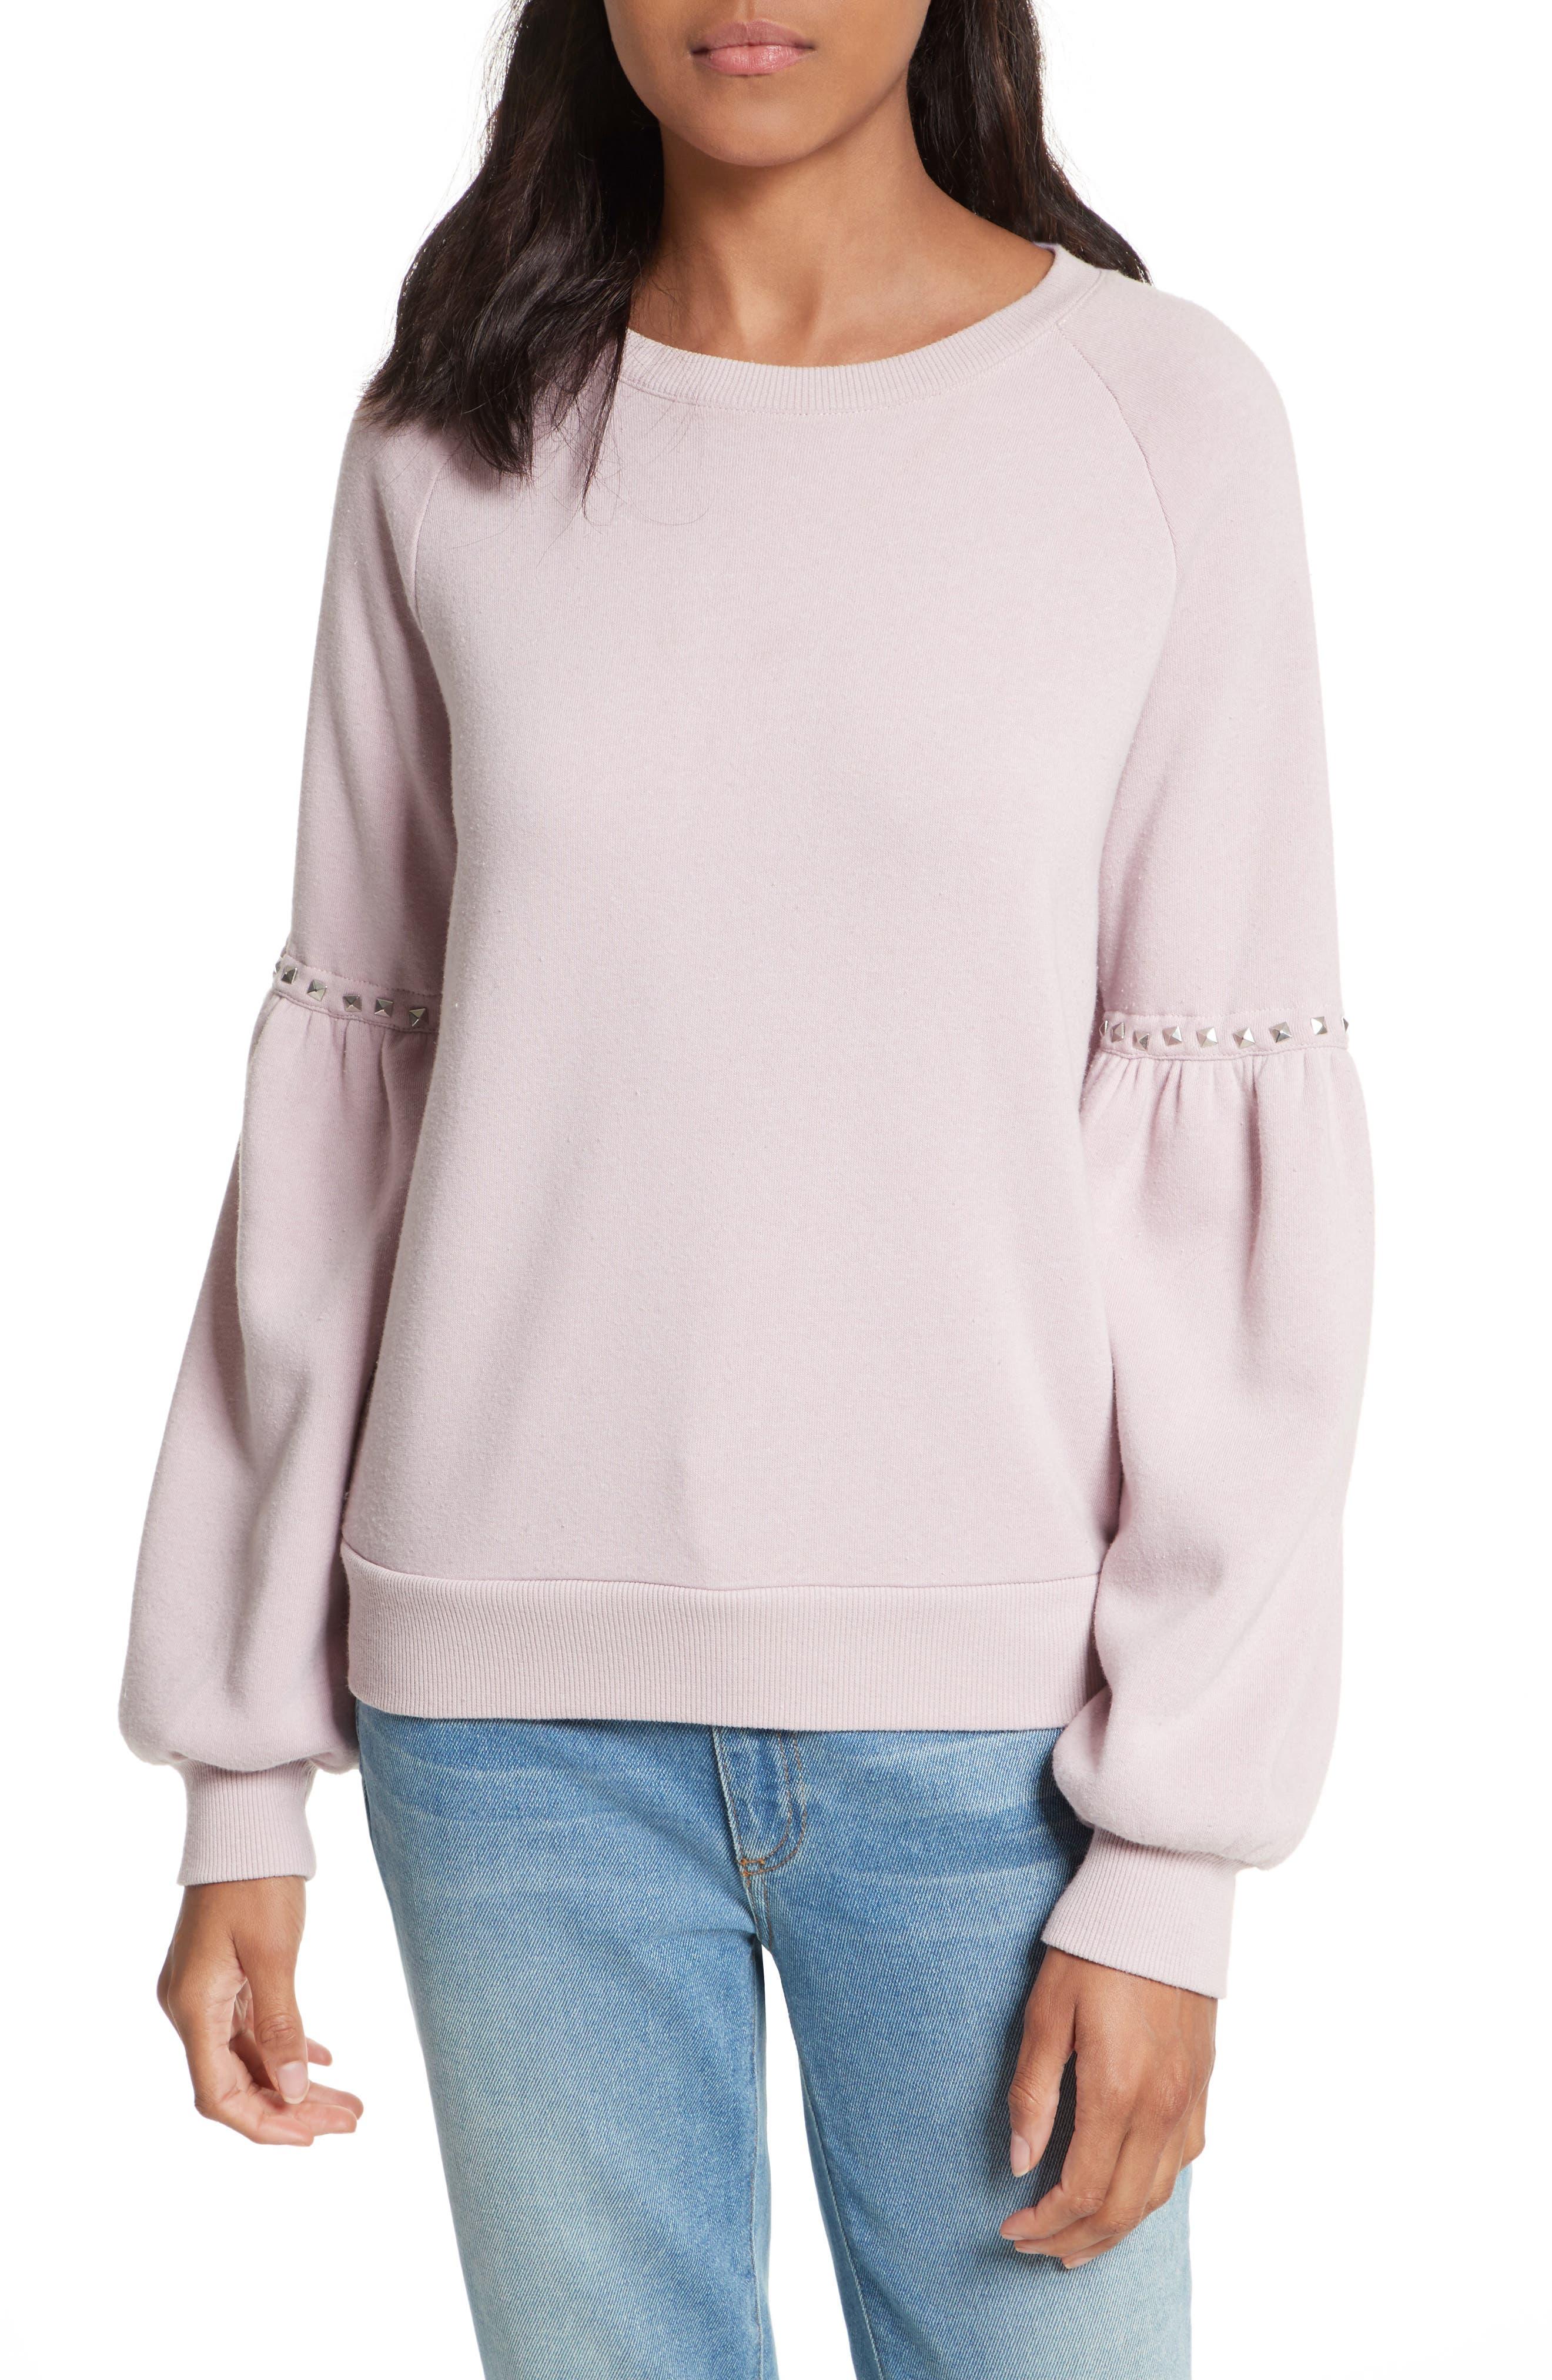 Alternate Image 1 Selected - Rebecca Minkoff Clementine Sweatshirt